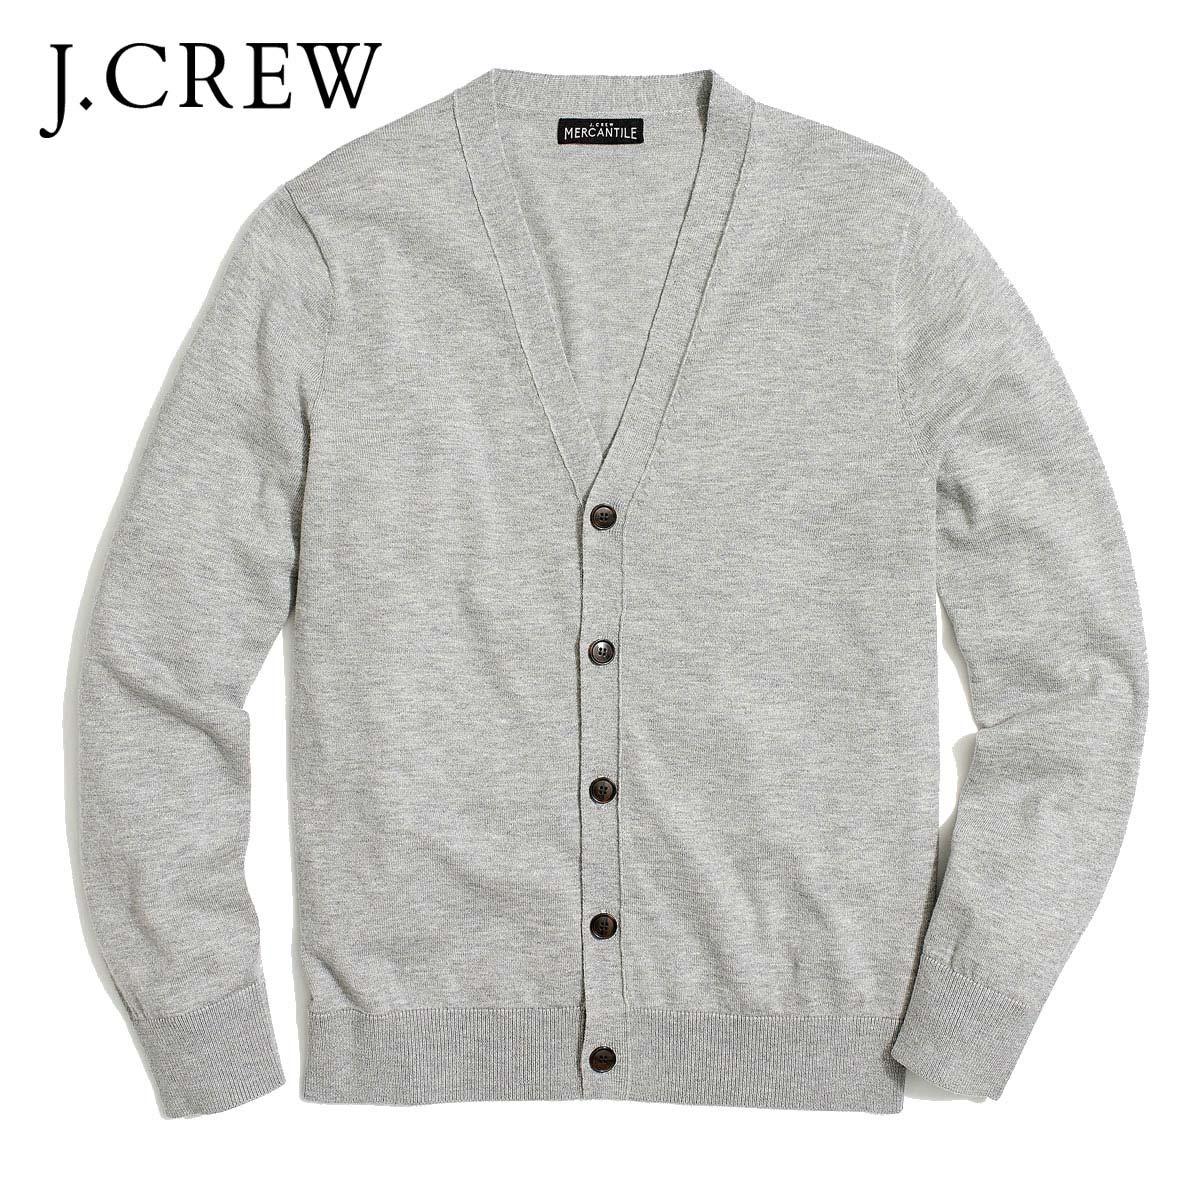 J.Crew Mercantile Mens Cotton Shawl Cardigan Cardigan Sweater